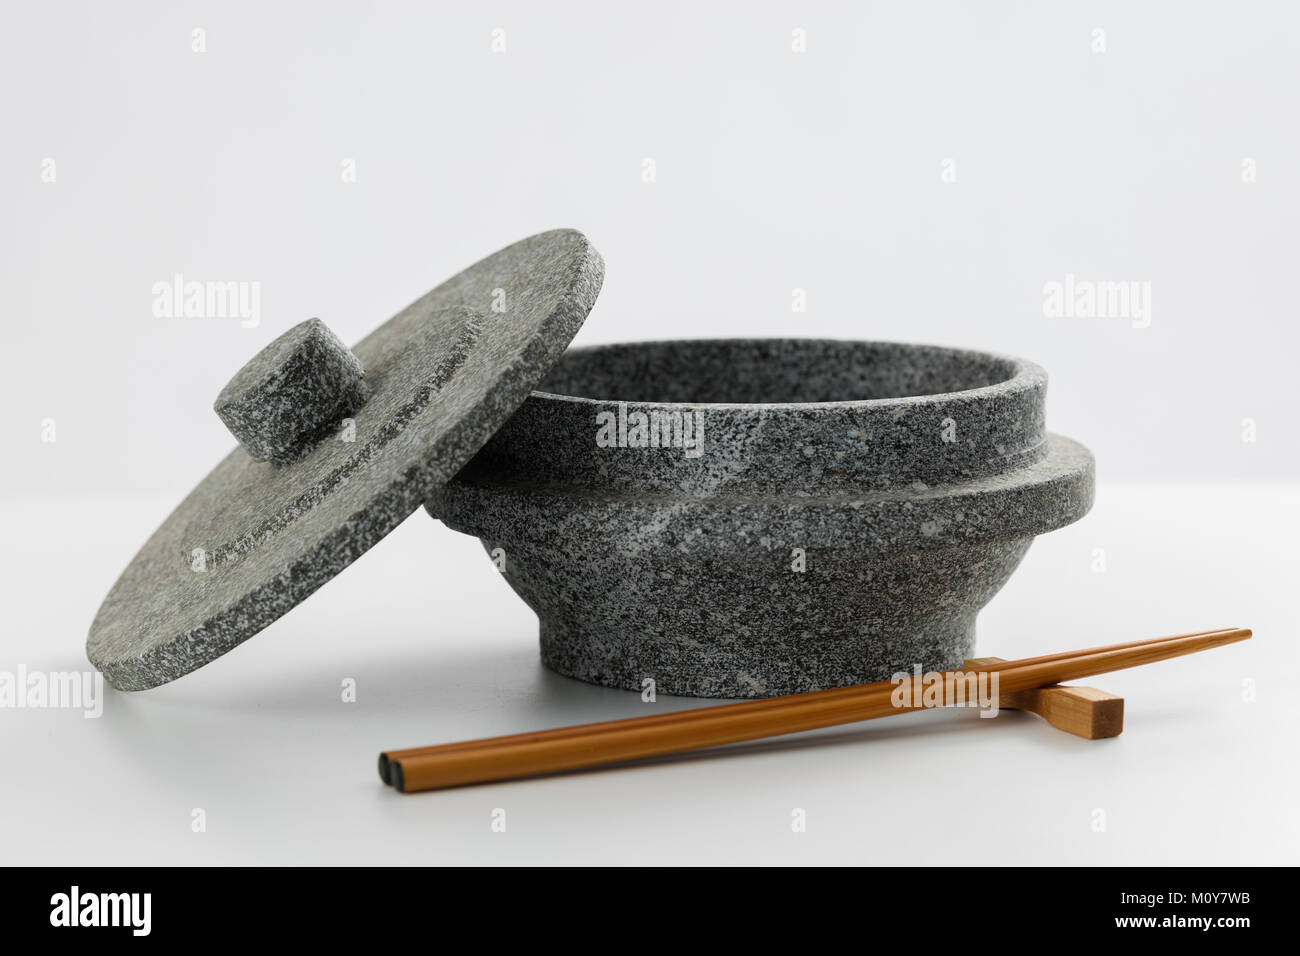 ornamental pots - Stock Image